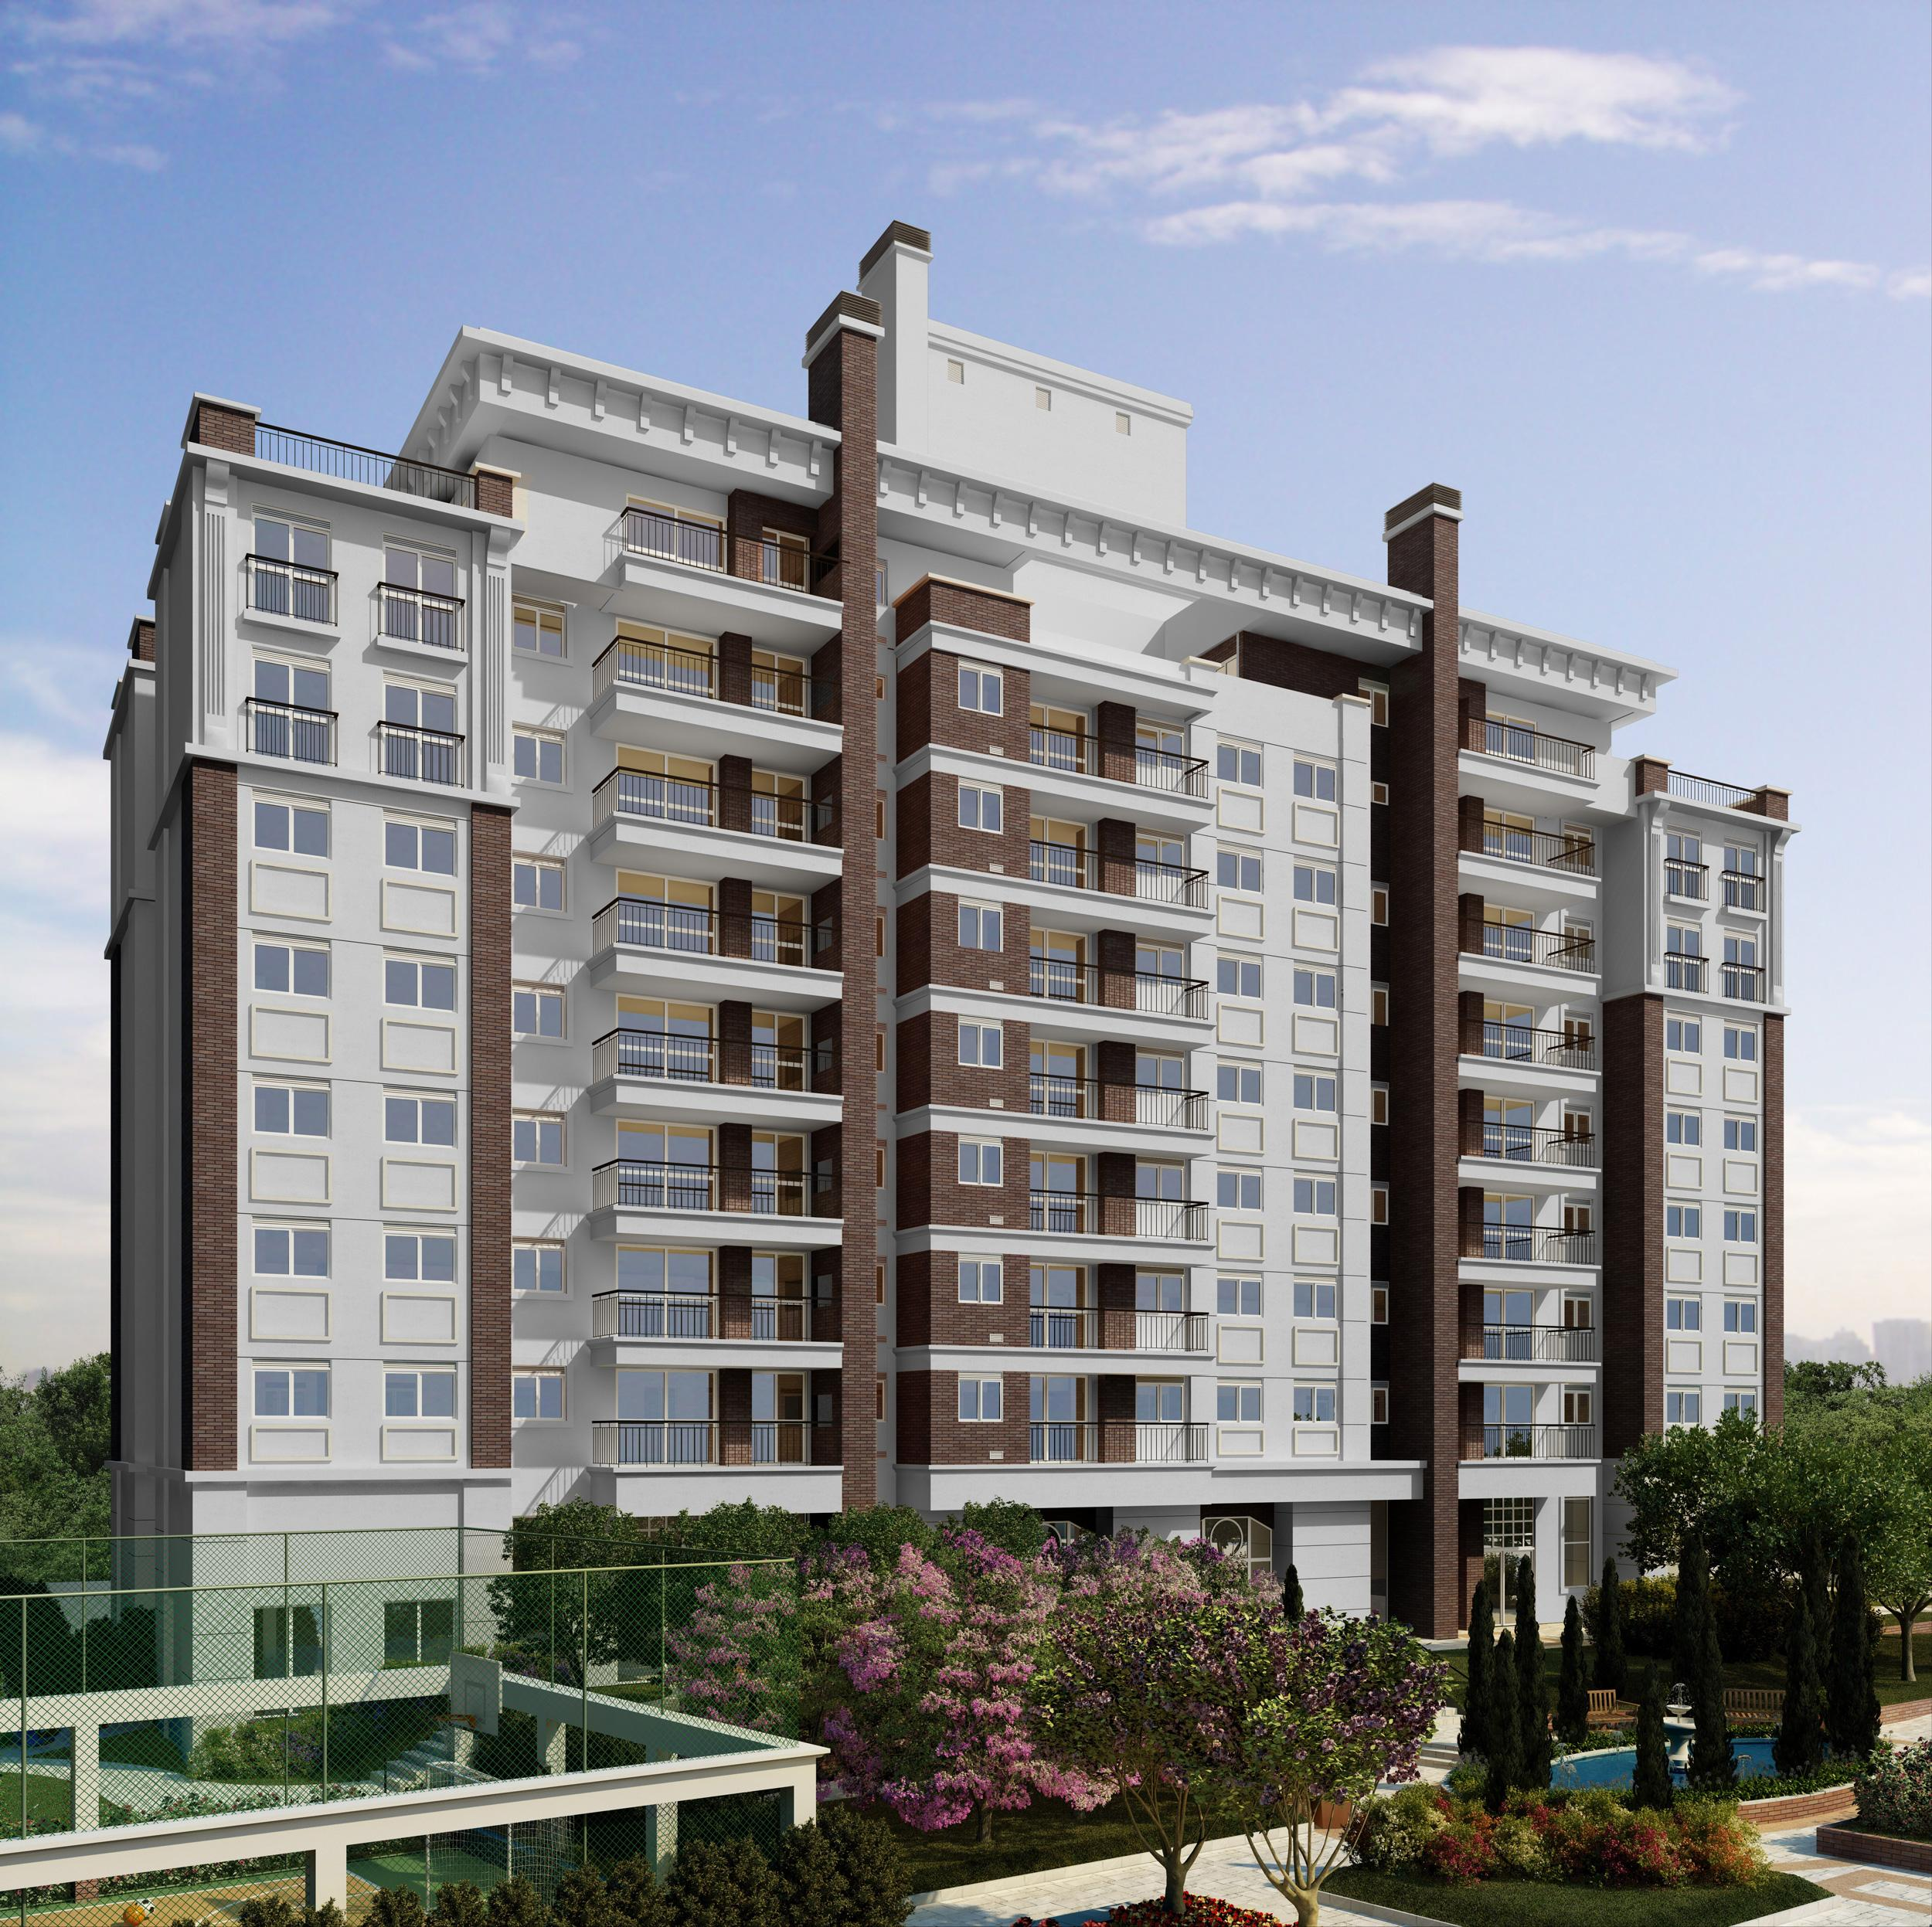 Fachada | WestSide Comfort Residences – Apartamentono  Vila Izabel  - Curitiba - Paraná